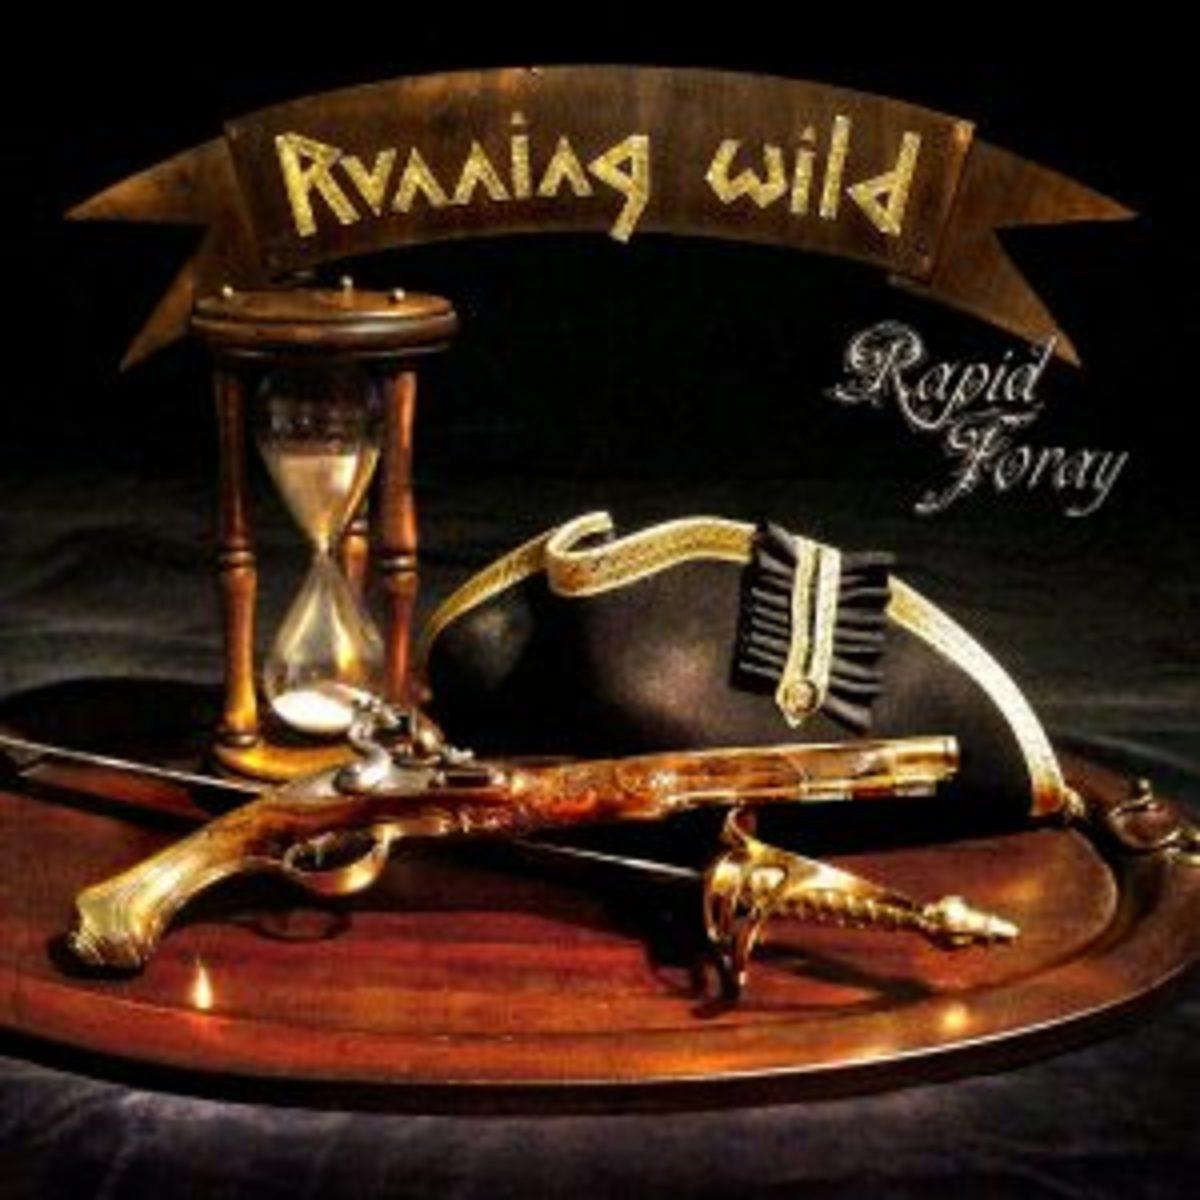 Running_Wild_Rapid_Foray_1500x1500px